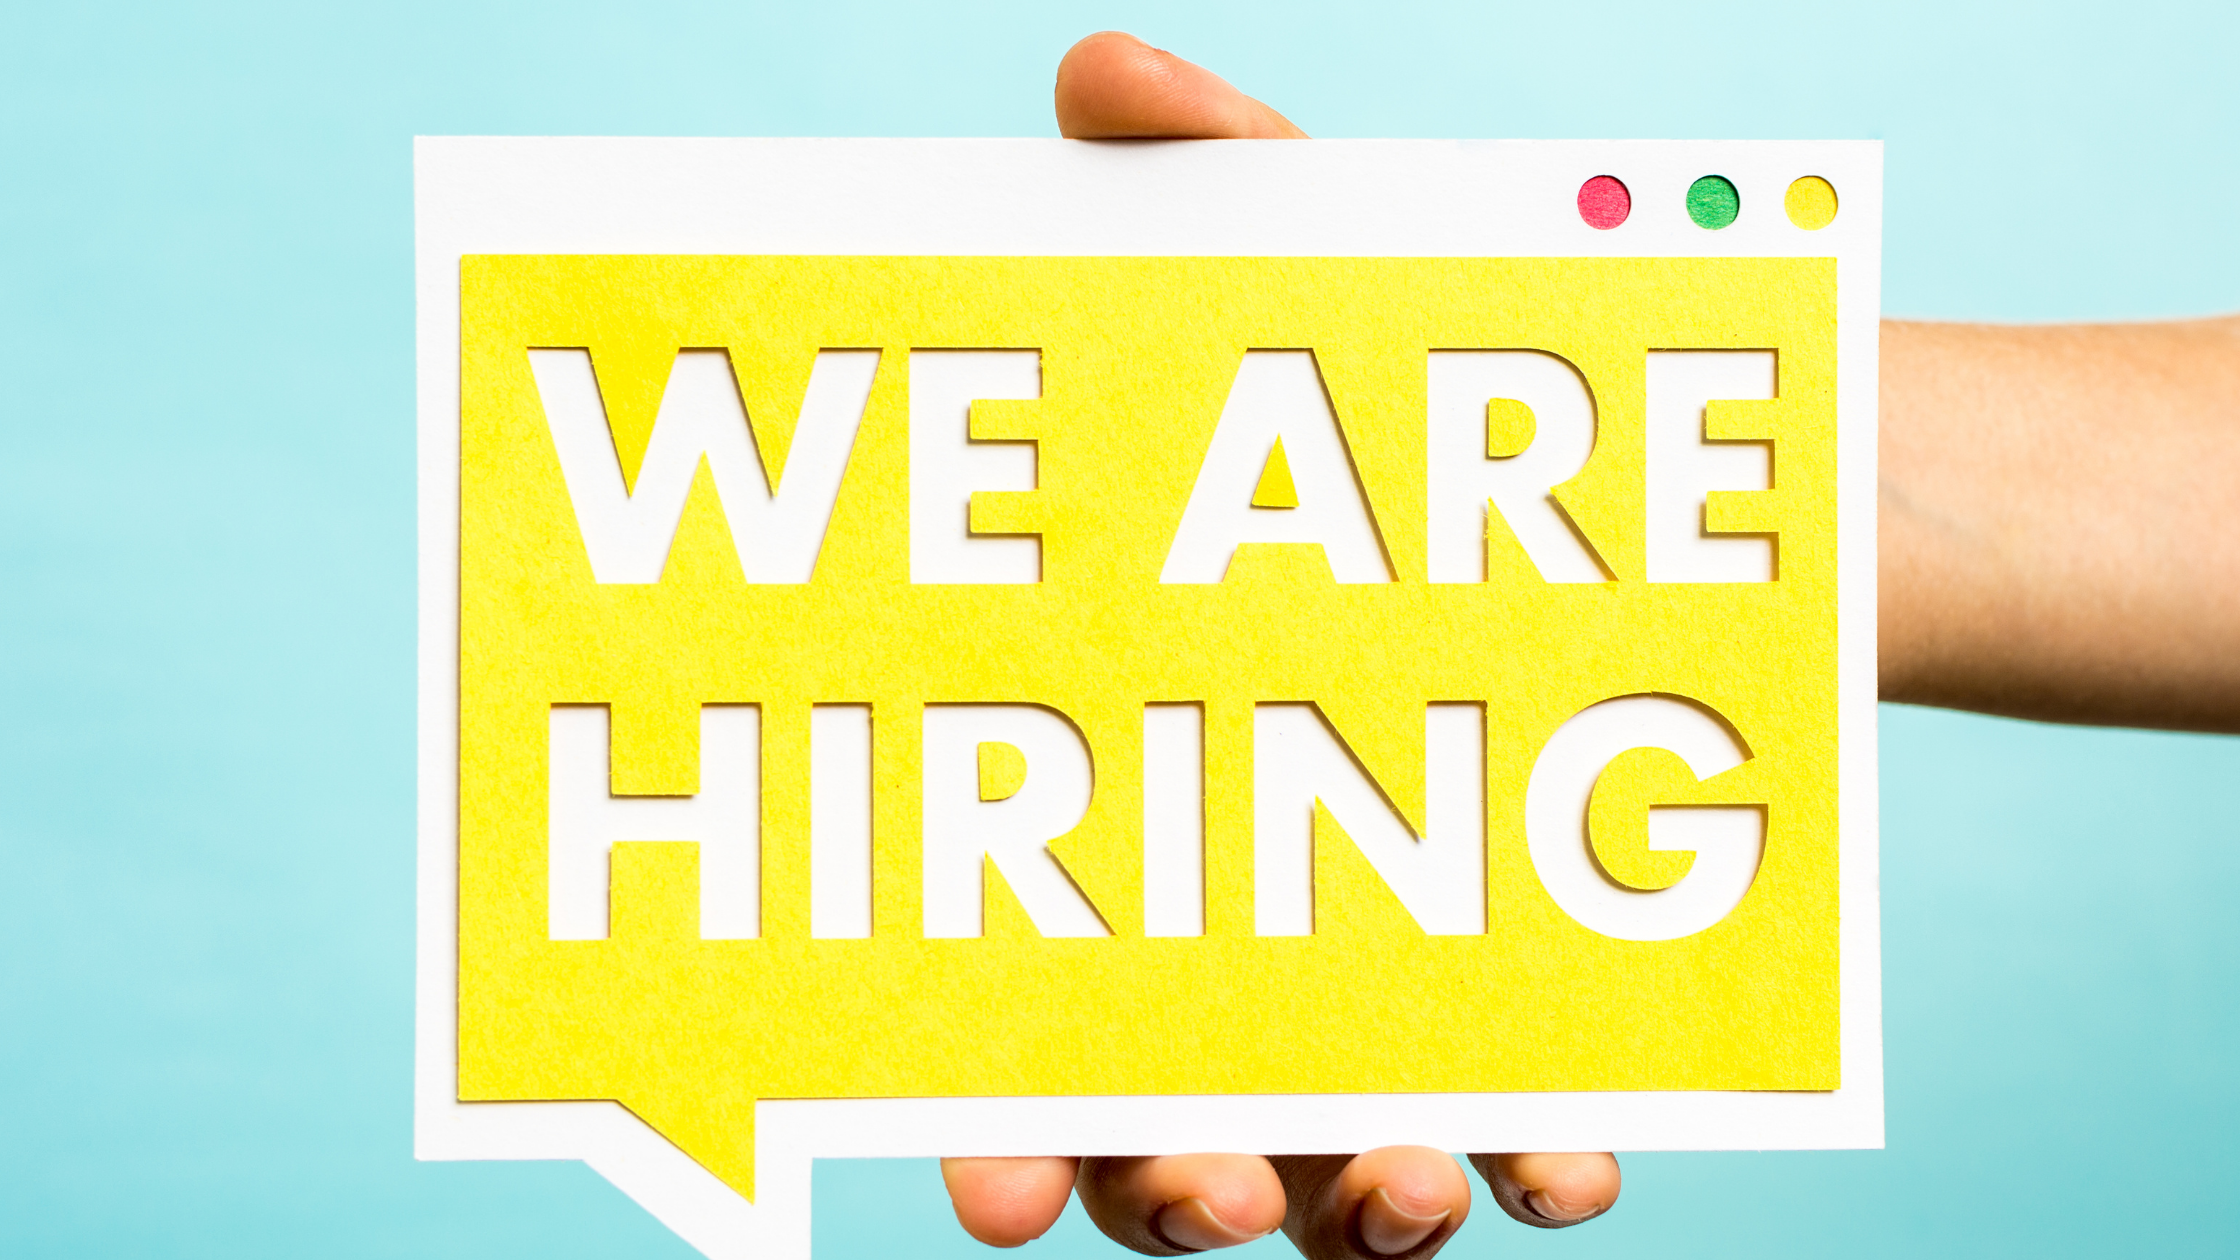 Happity is hiring - kickstarter job opportunity